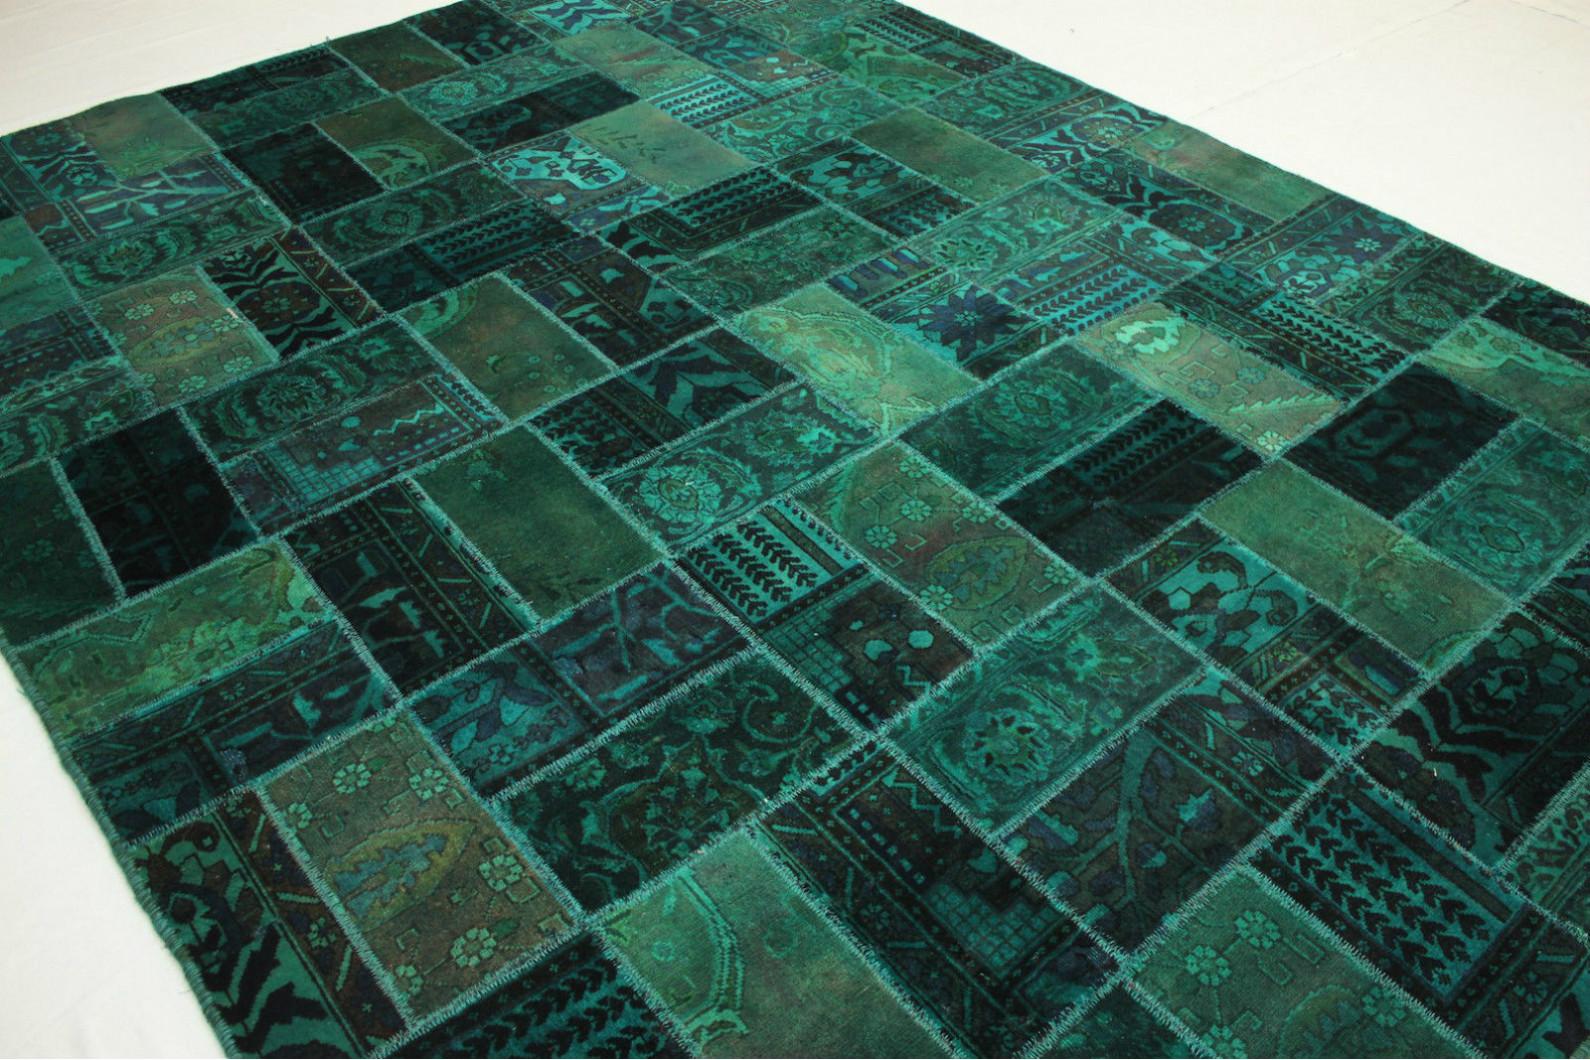 patchwork teppich gr n t rkis in 320x240cm 1001 1677 bei kaufen. Black Bedroom Furniture Sets. Home Design Ideas